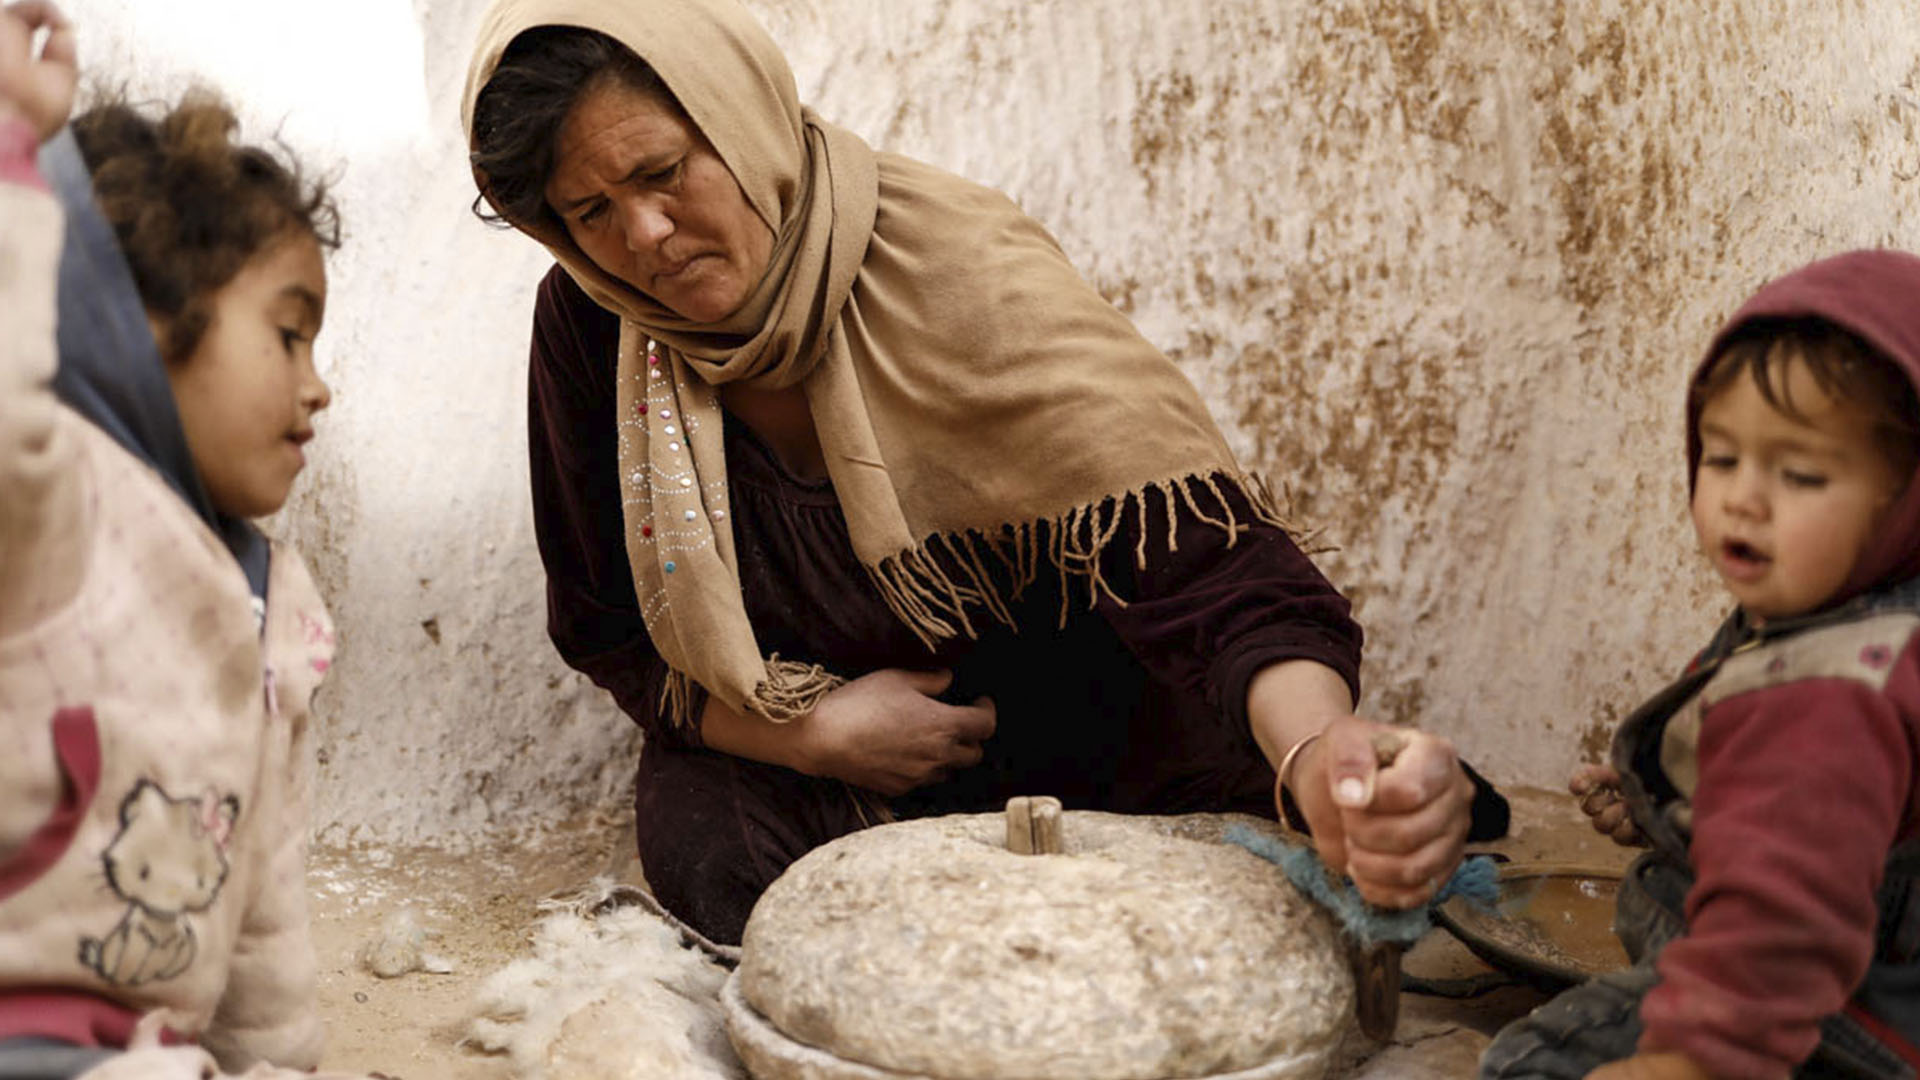 Un molino de trigo para fabricar harina